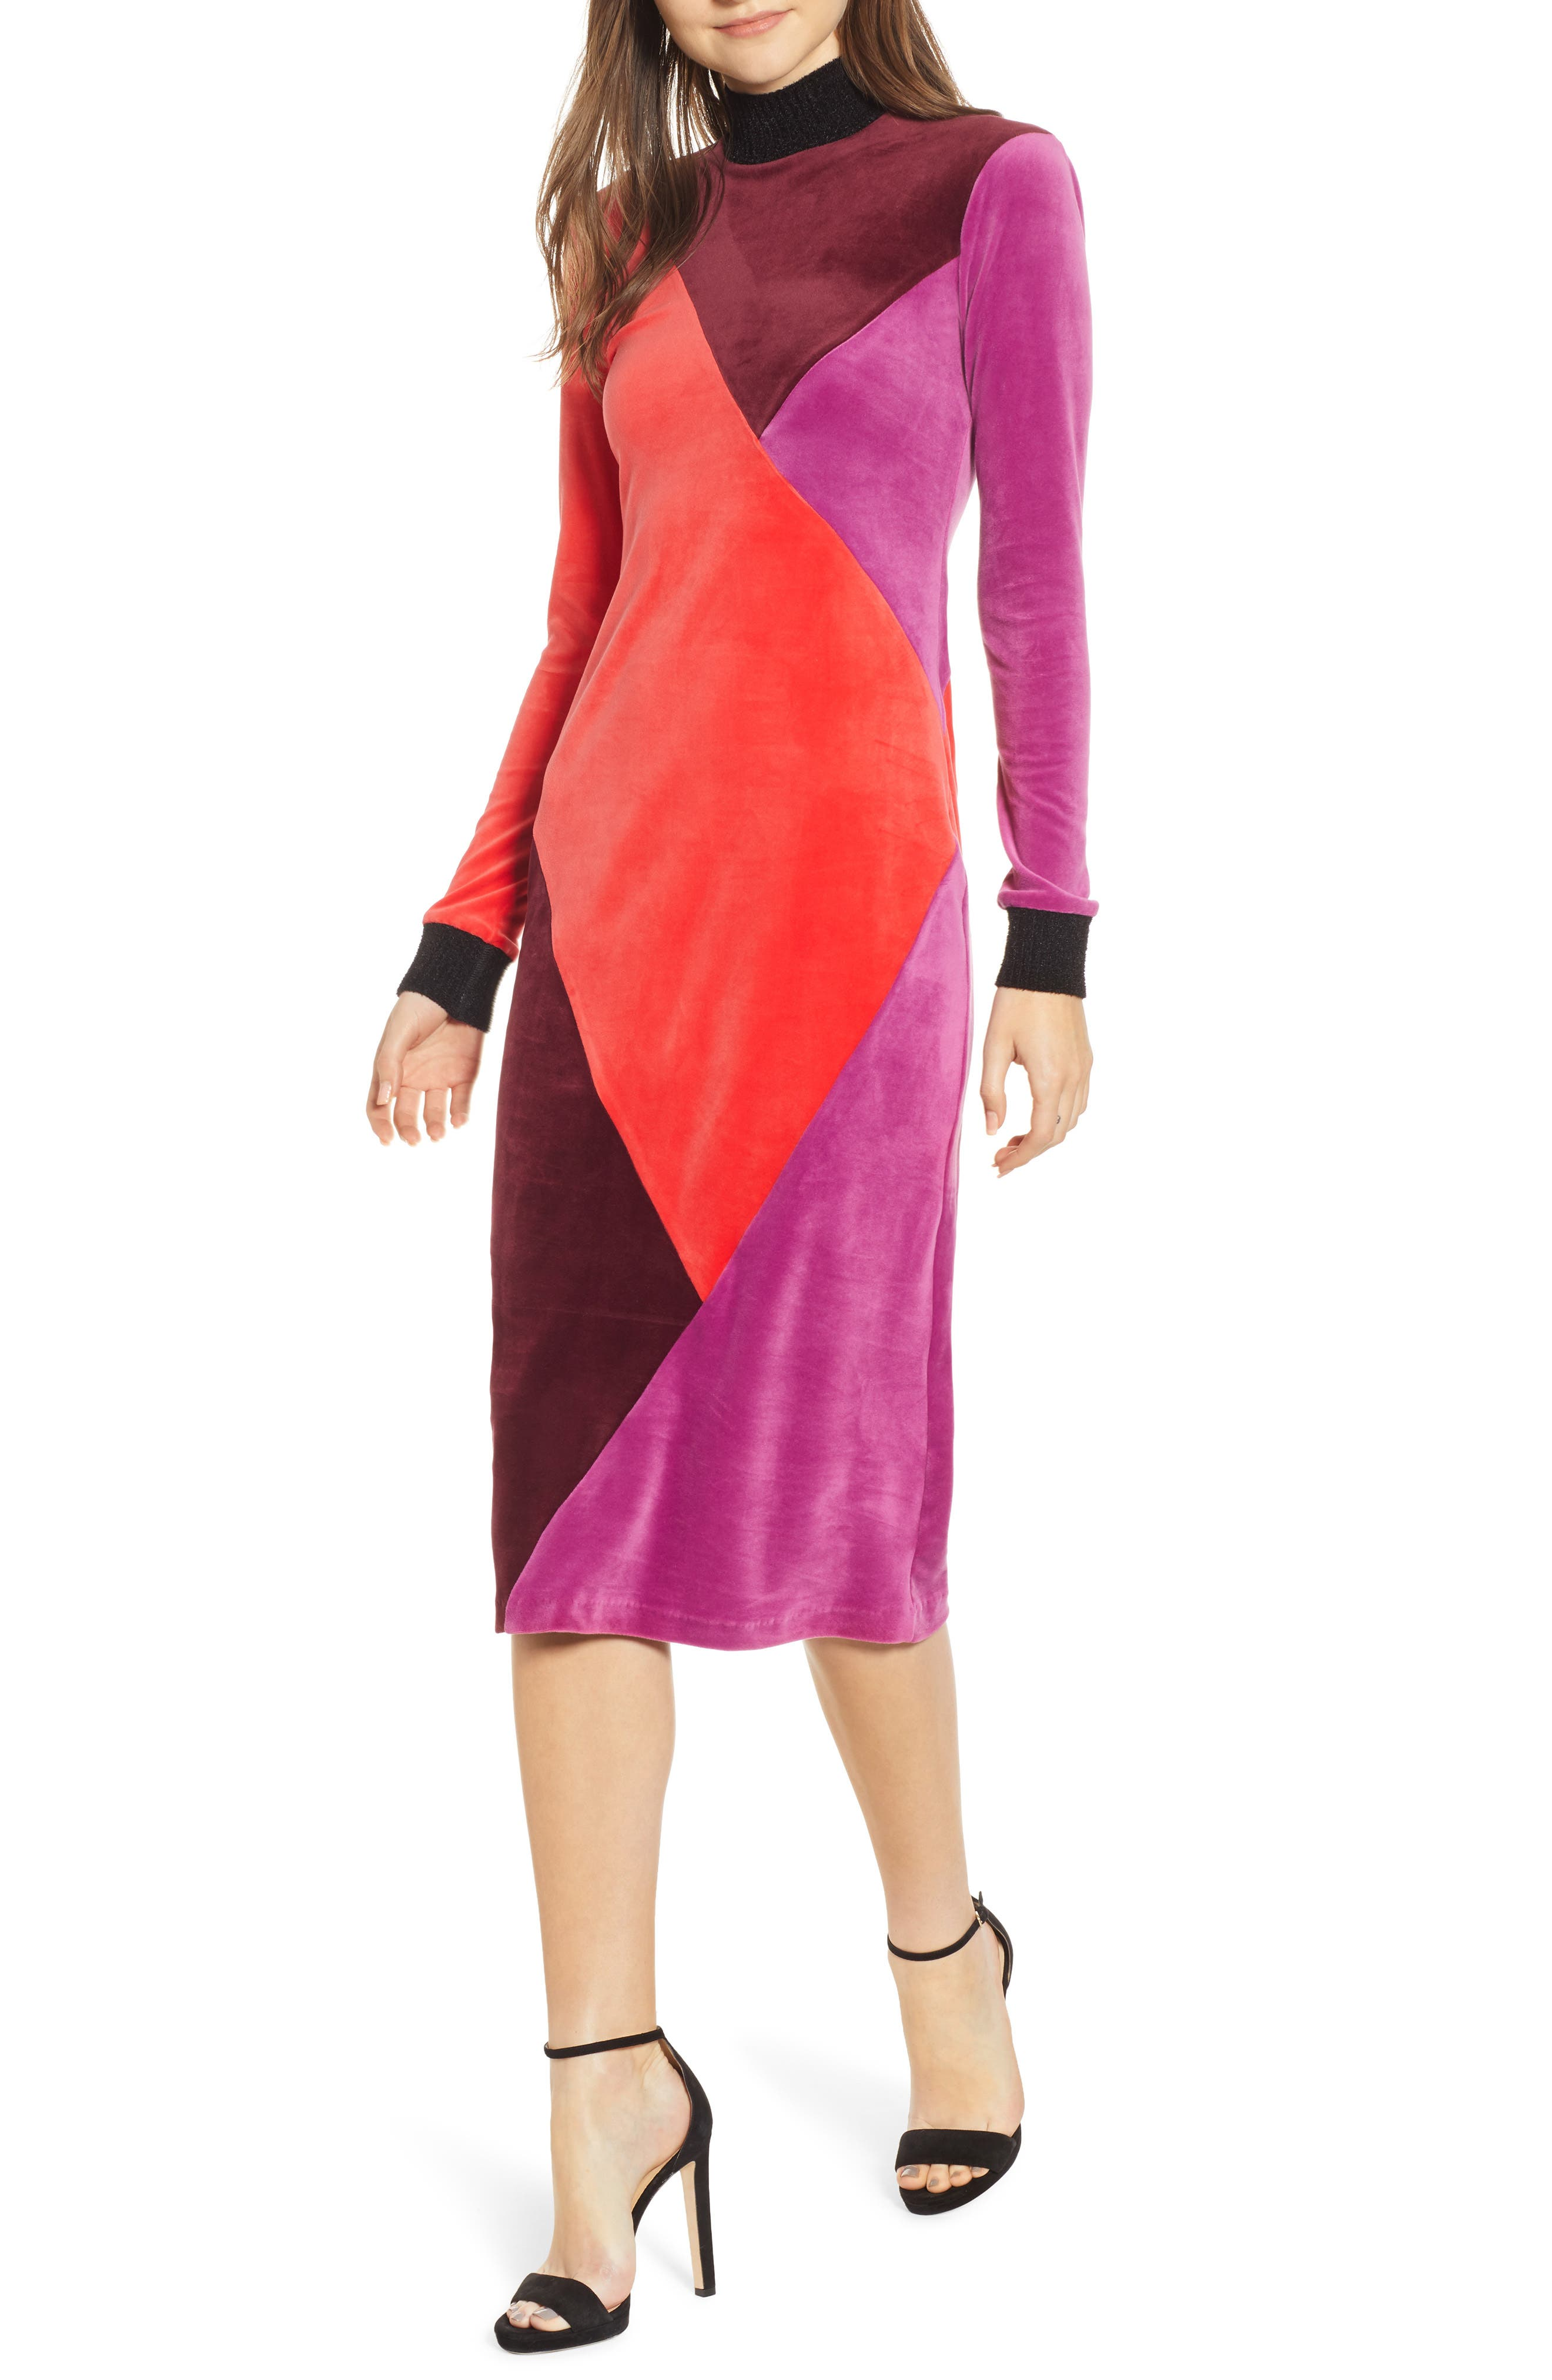 SPLENDID Velluto Velour Midi Dress, Main, color, 502